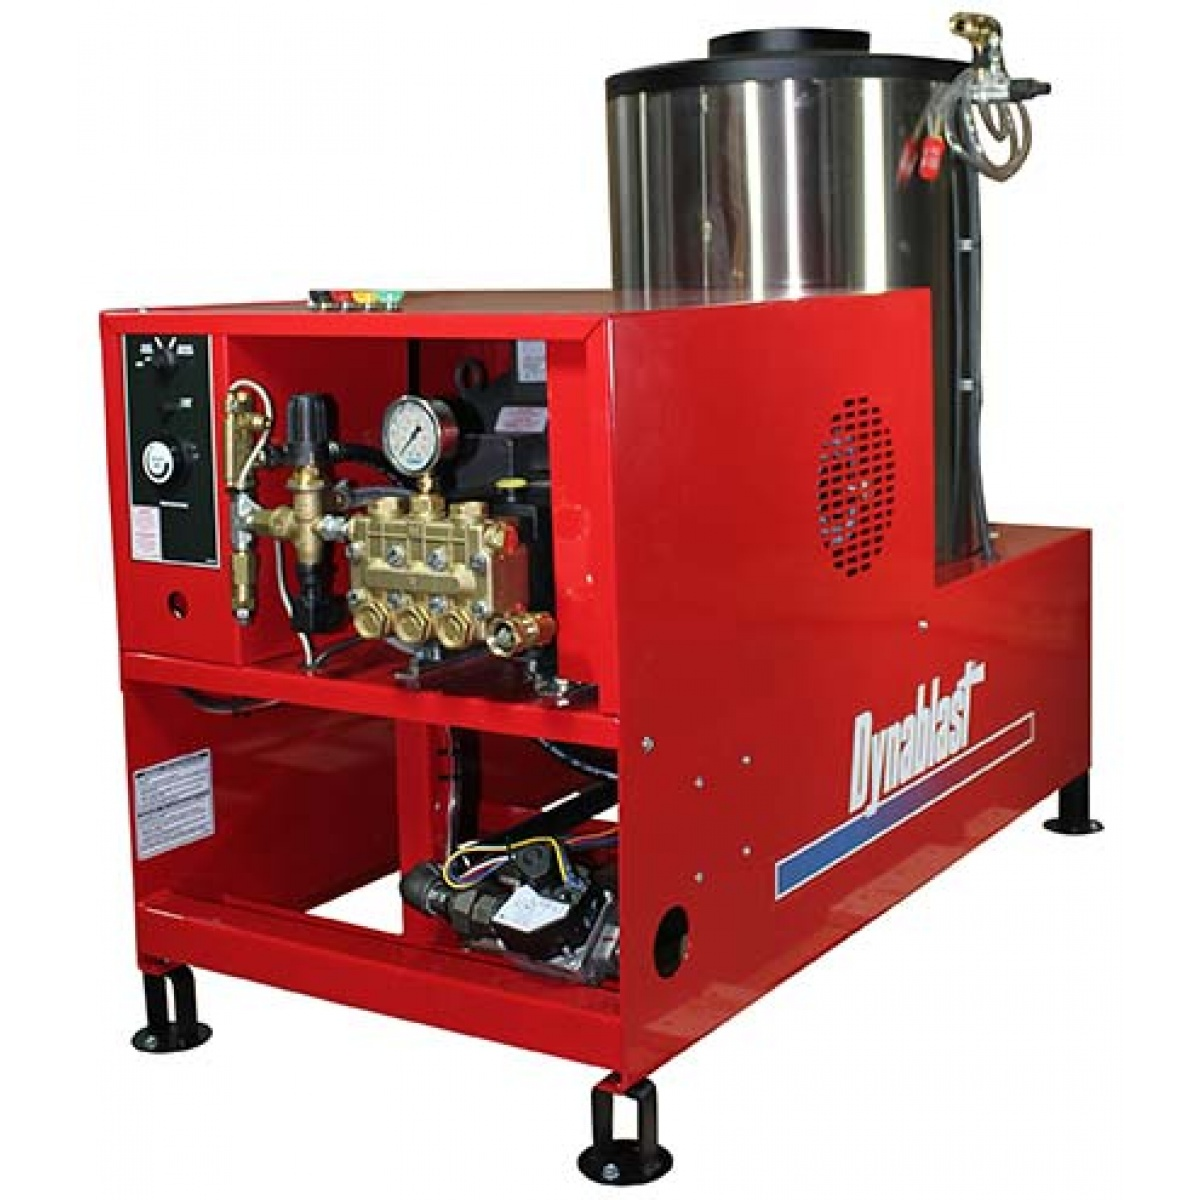 Dynablast UHE422BEP3D Hot Water Pressure Washer